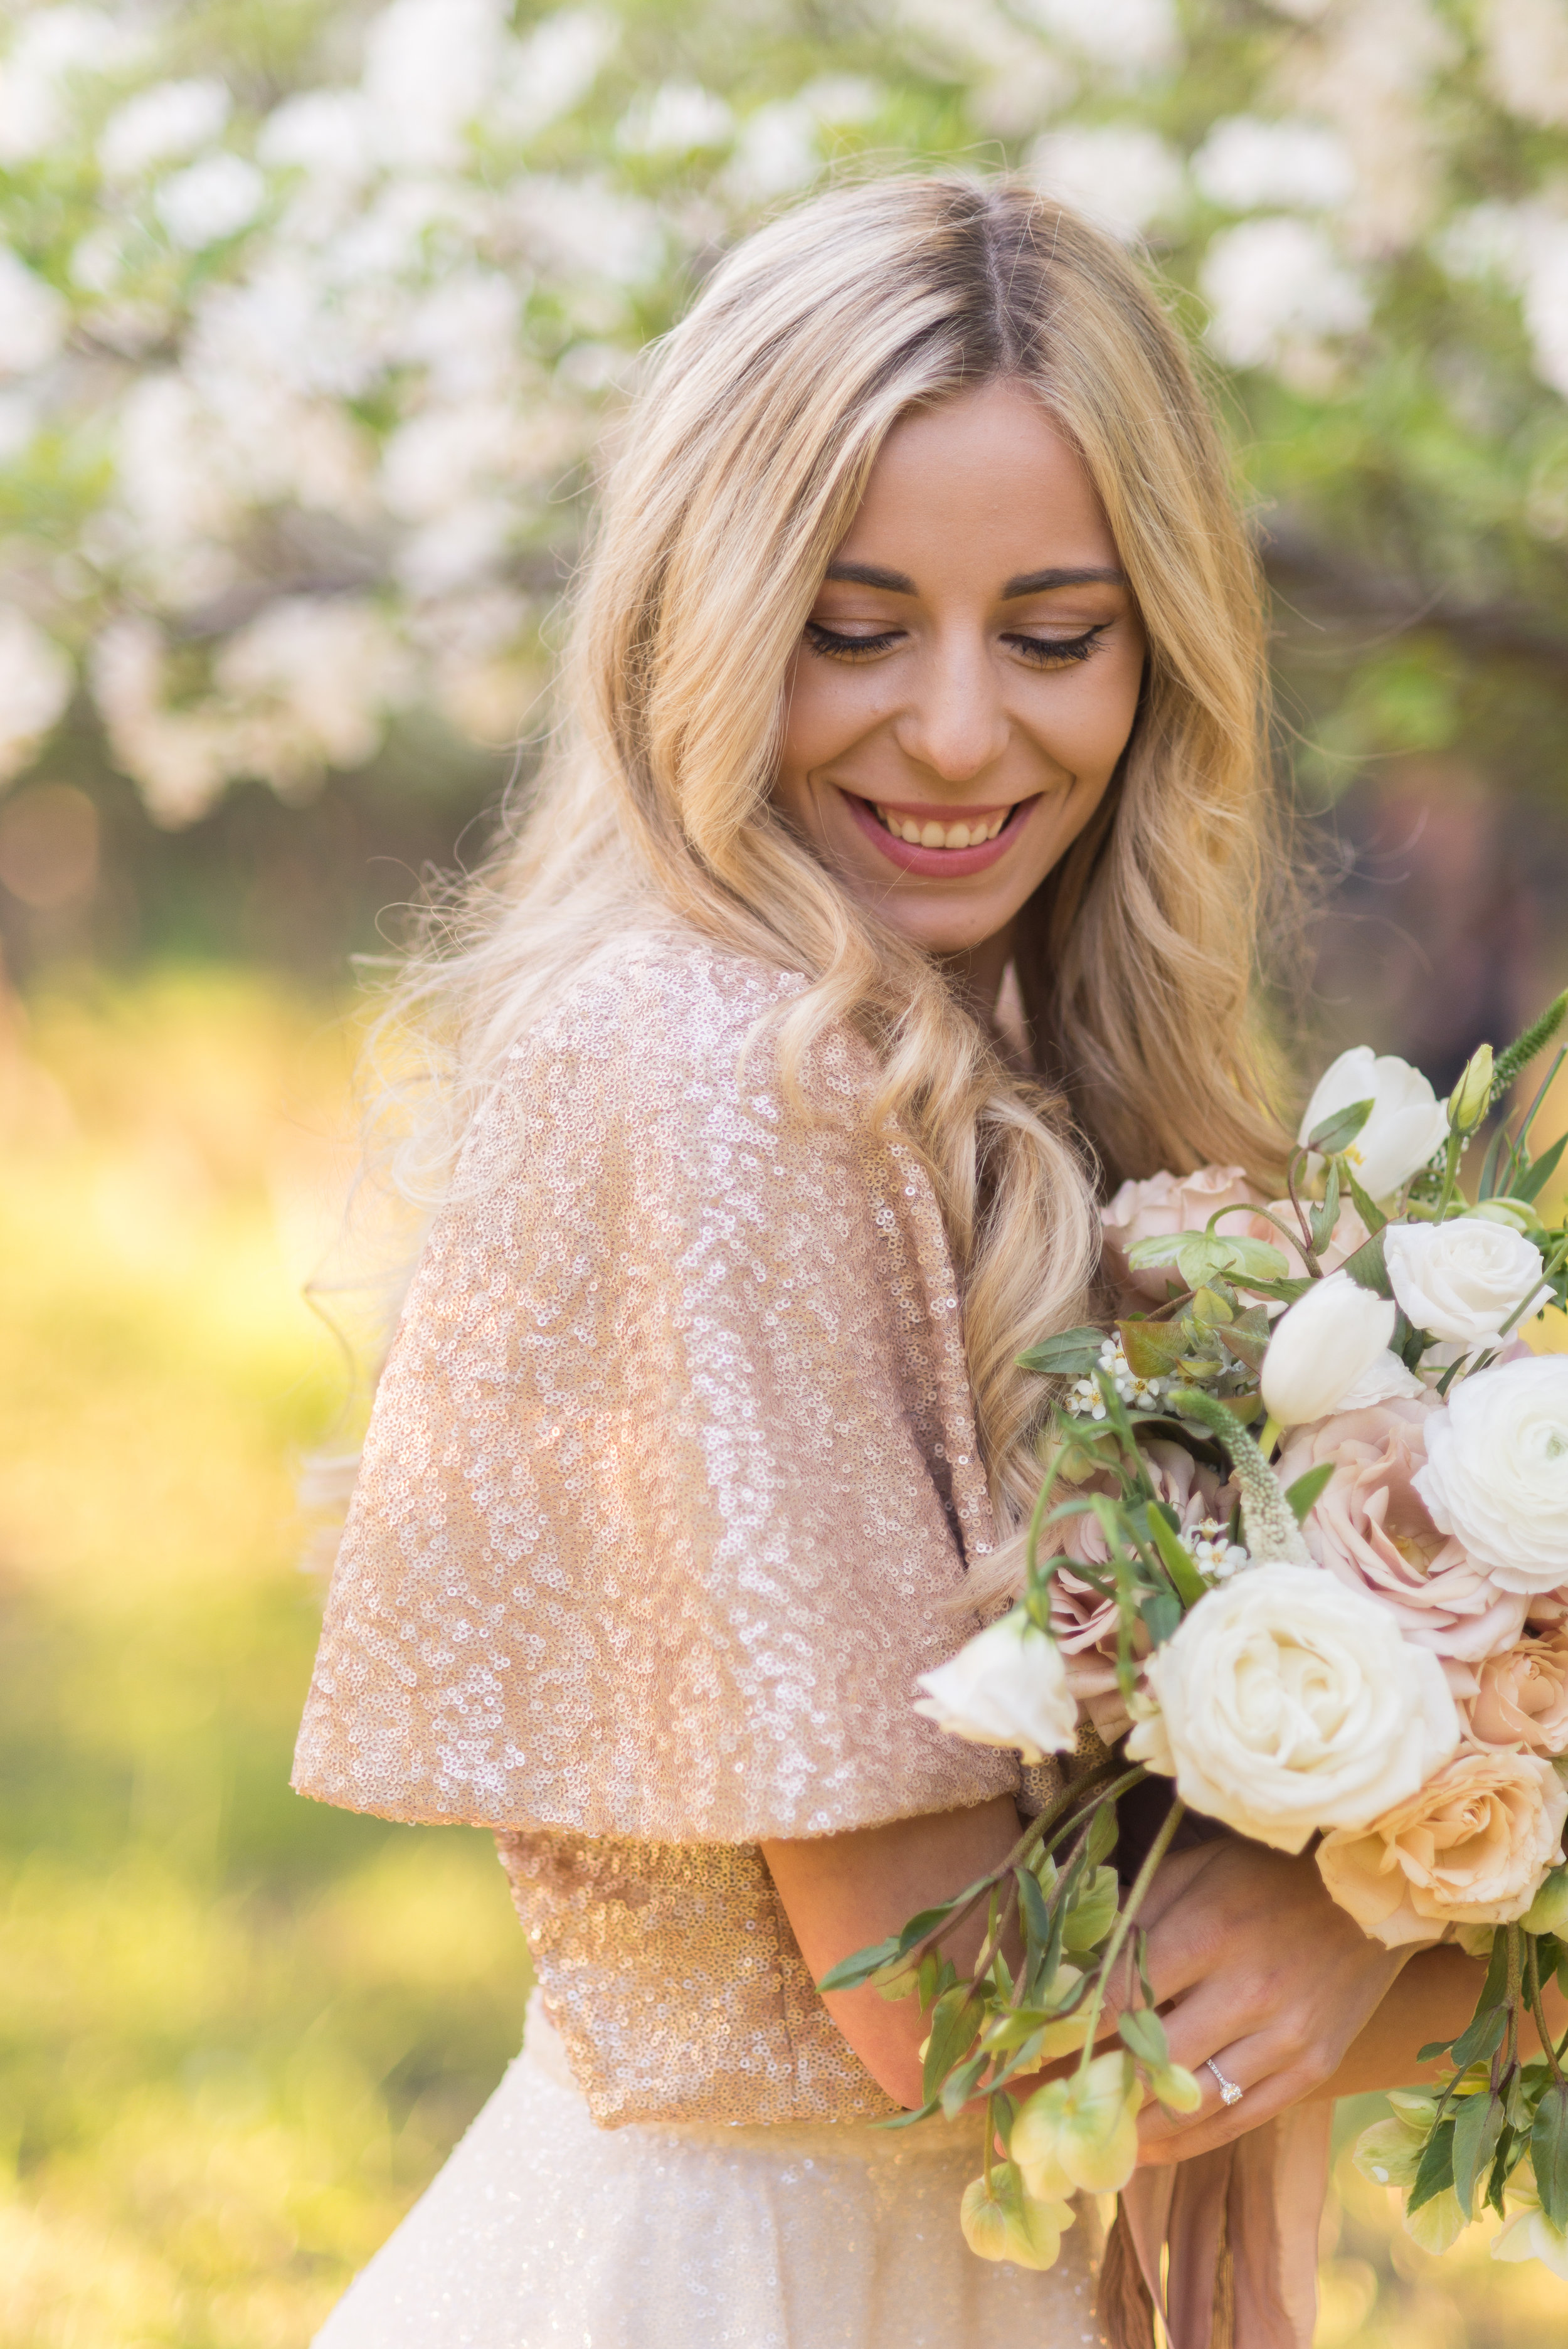 Provo Orchard + Utah photographer + Utah bridals-143.jpg